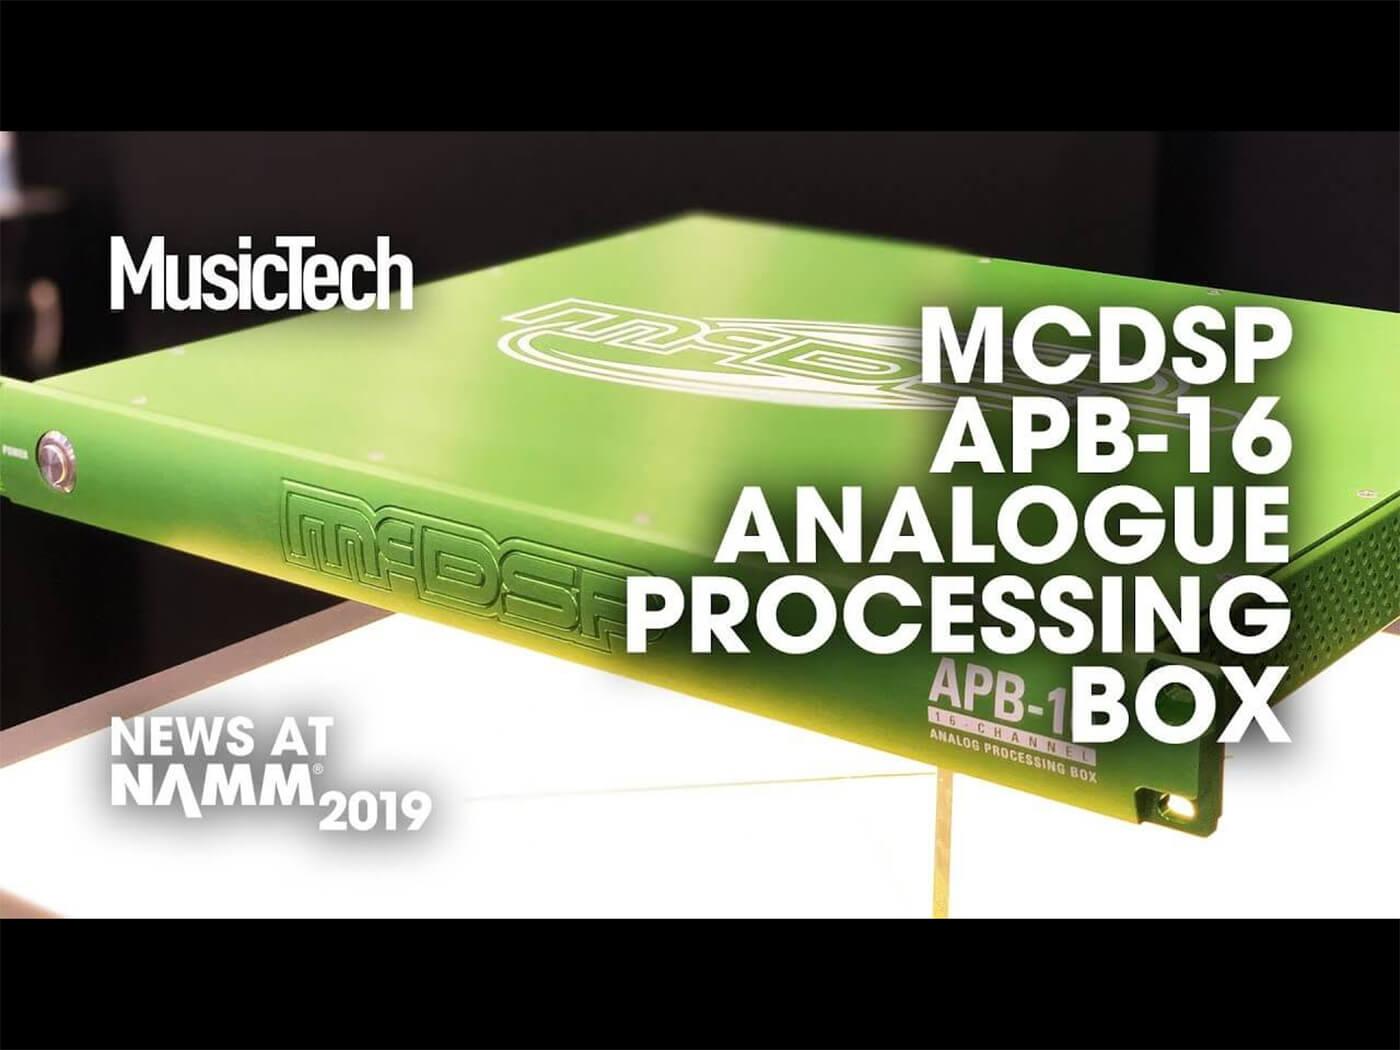 McDSP APB-16 Processing Box